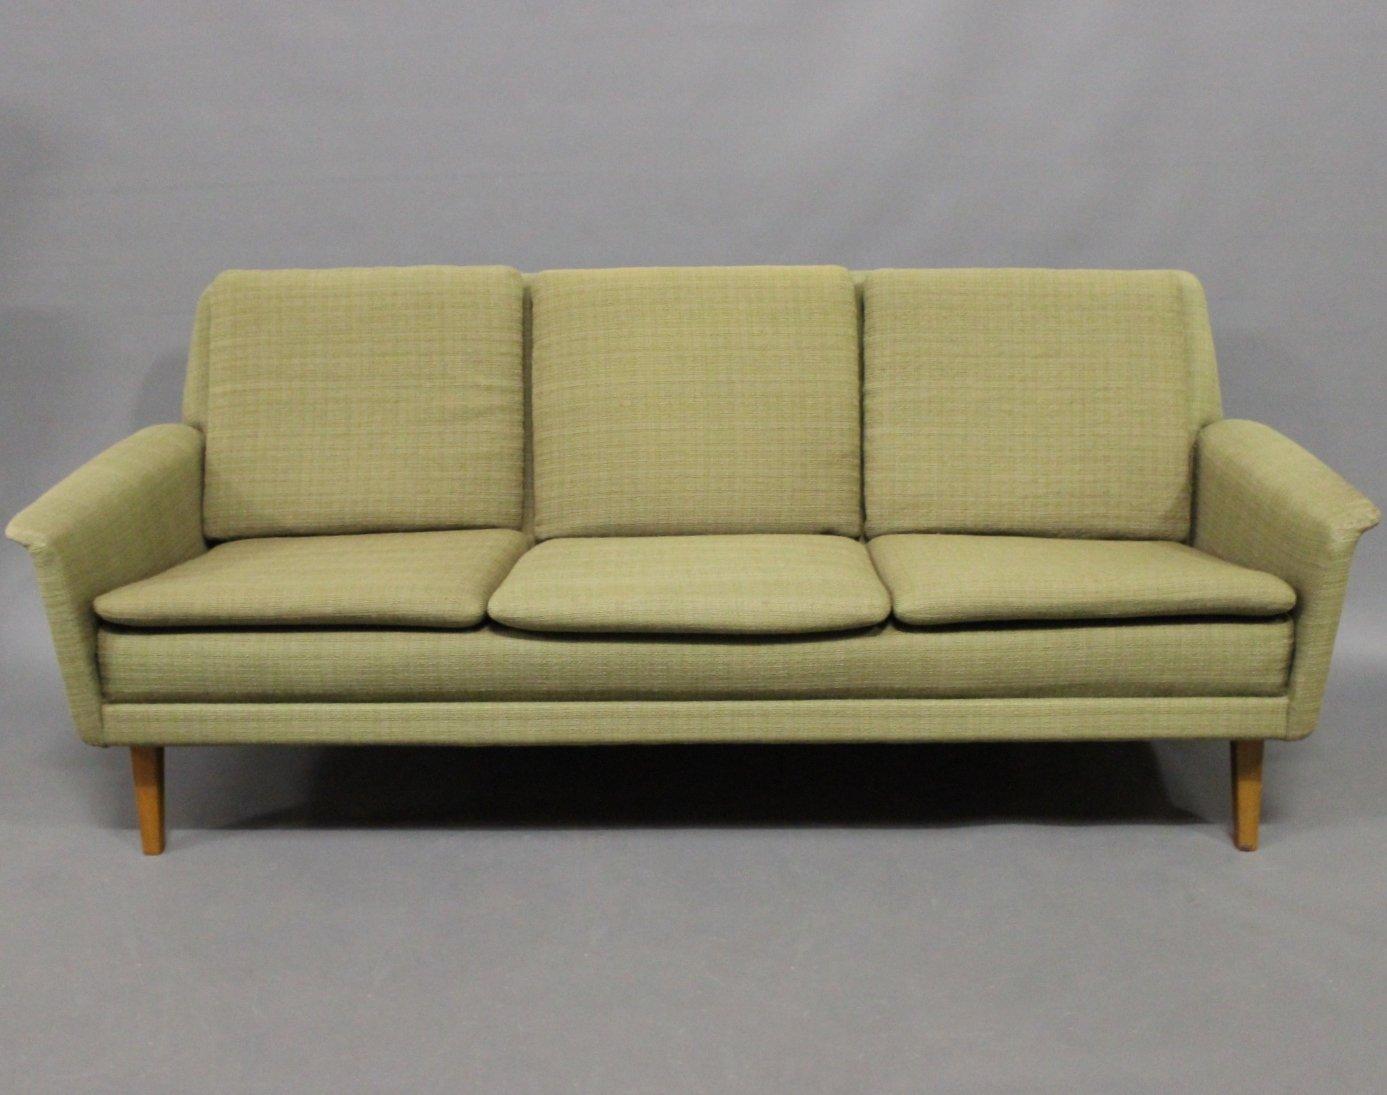 dux sofa by folke ohlsson snuggle home sh memory foam sleeper mattress 3 seater for fritz hansen 1960s